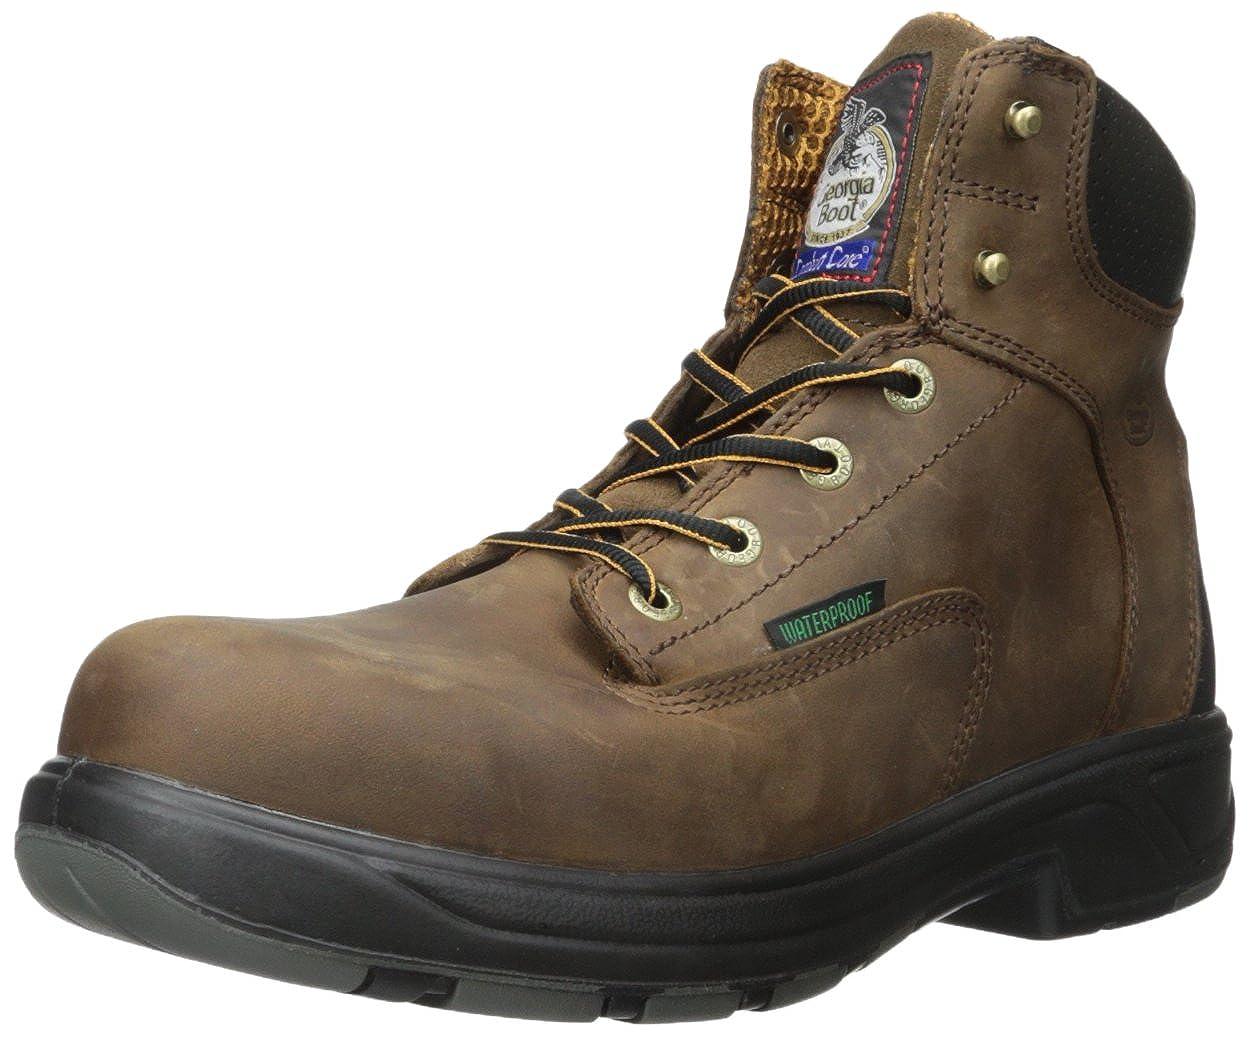 Amazon Com Georgia Boot Flxpoint Composite Toe Waterproof Work